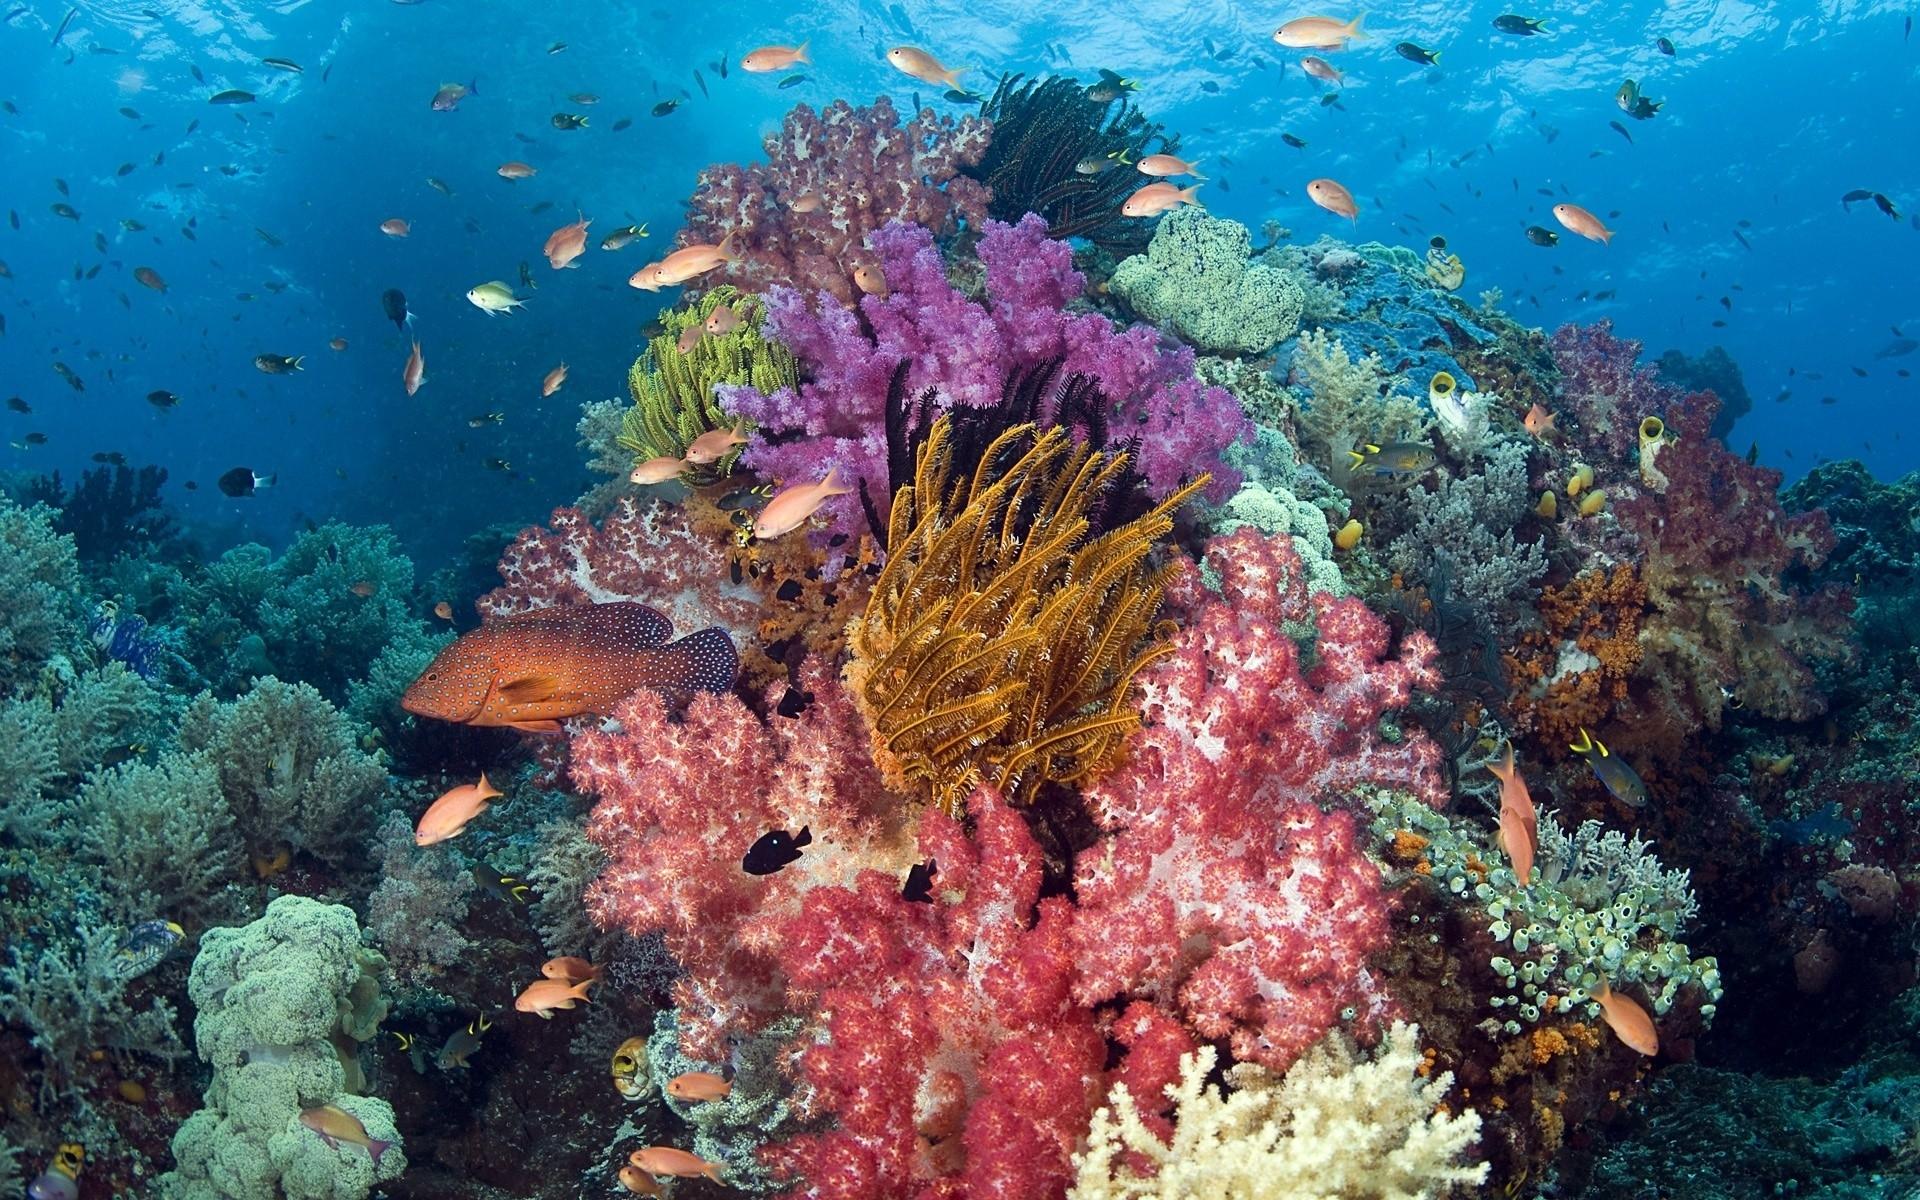 underwater coral reef ocean sea sunlight color wallpaper background 1920x1200